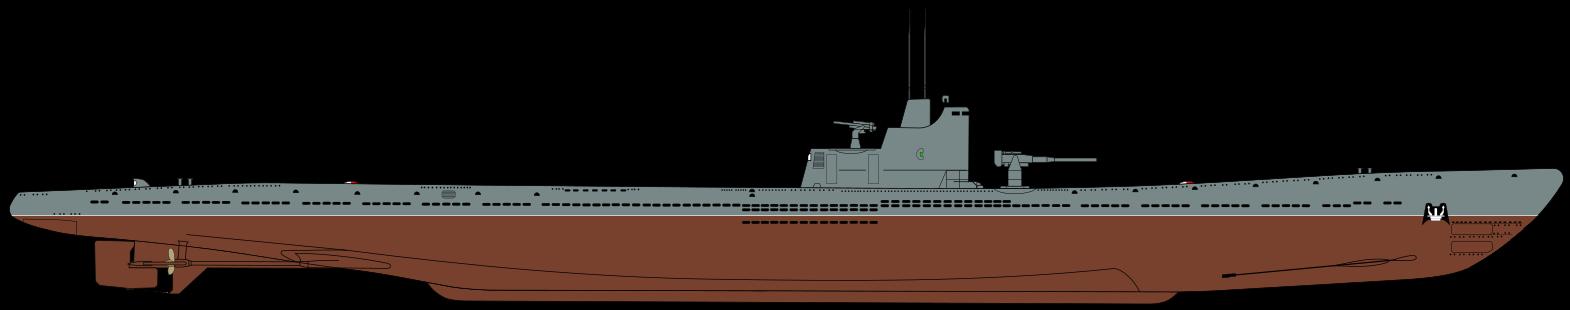 Силуэт подводной лодки С-56 типа «Средняя» серии IX-бис Silhouette of Soviet S-class submarine S-56 (IX-bis Serie)